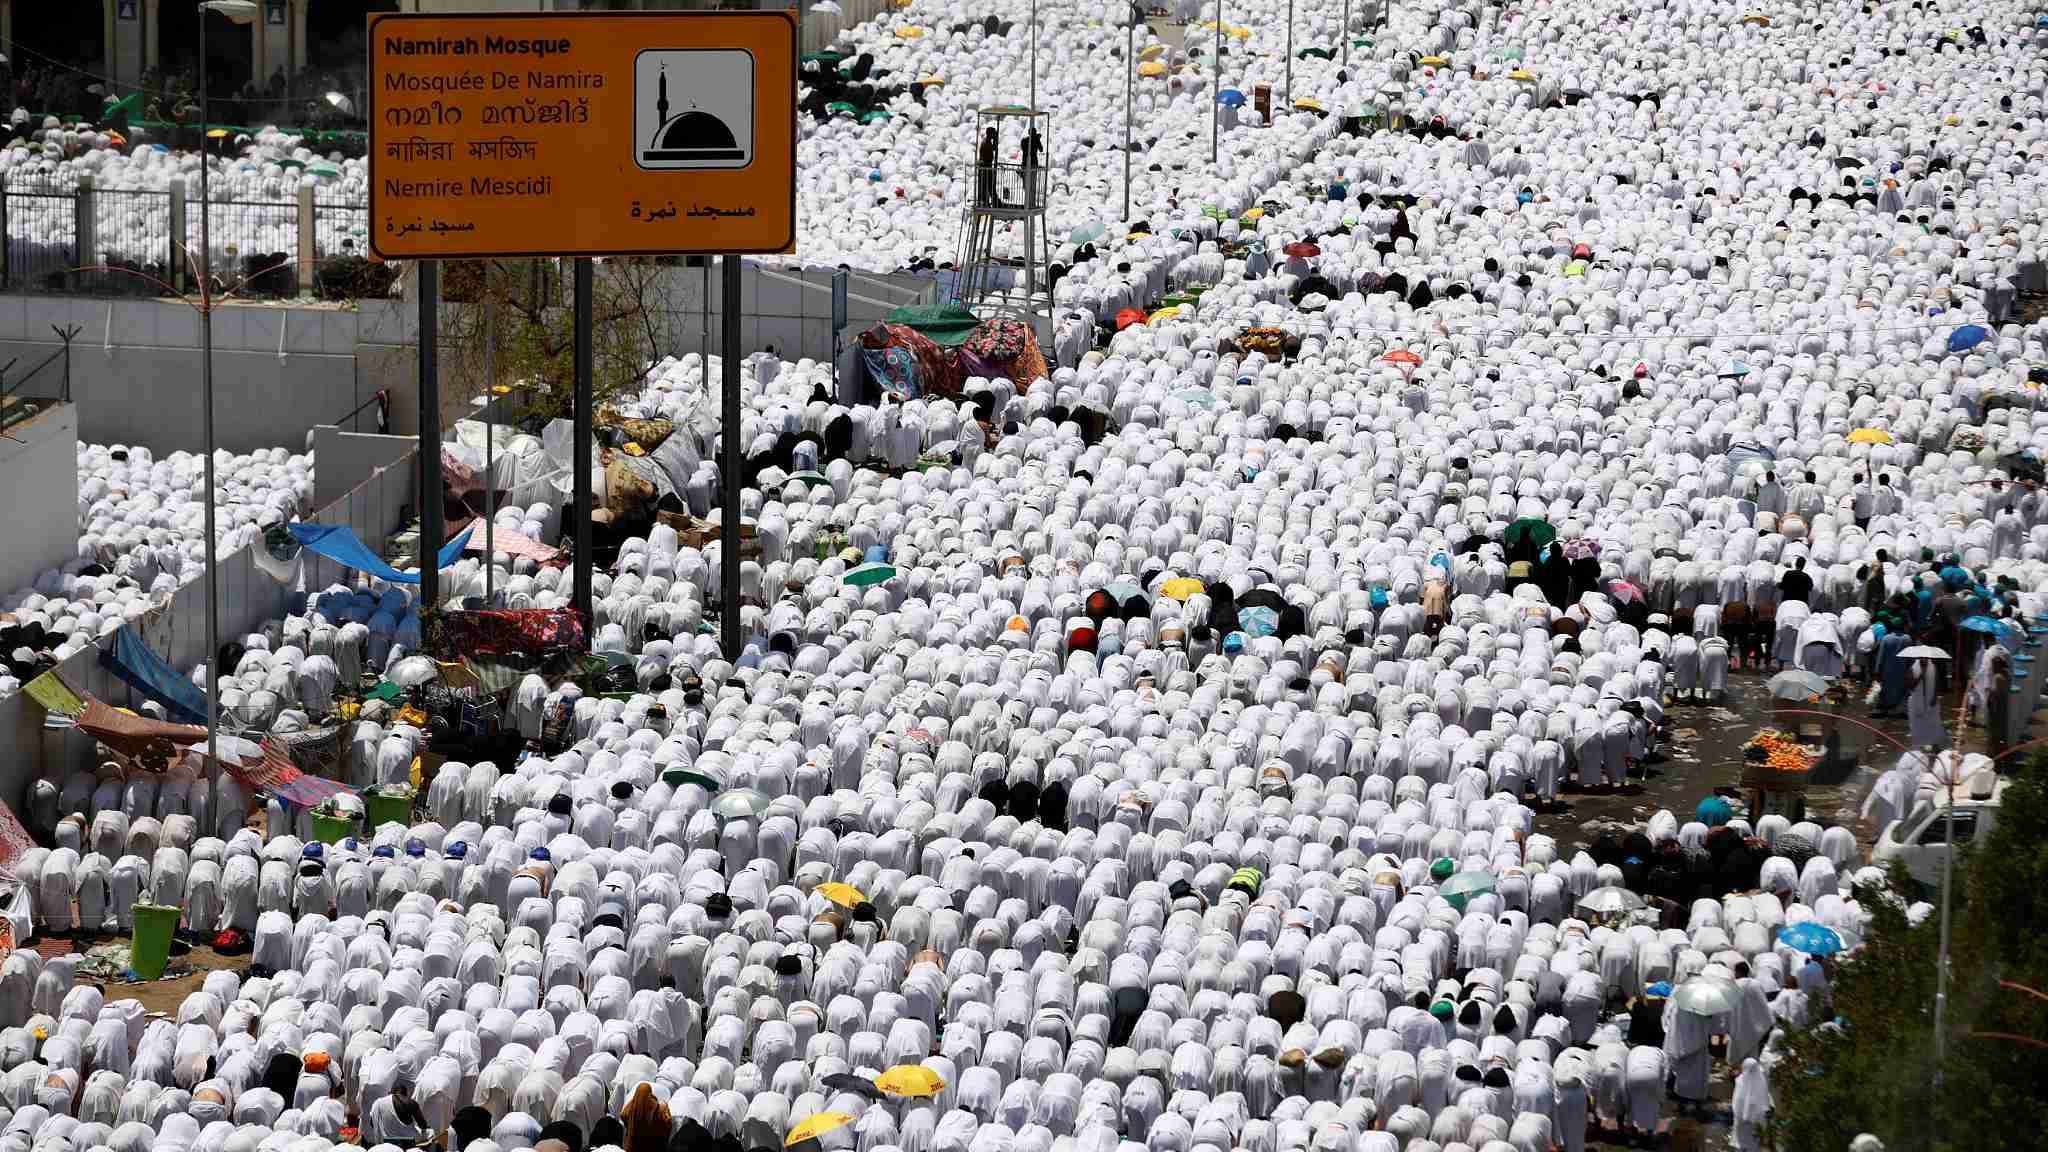 Muslim pilgrims gather on Mount Arafat for Hajj pilgrimage in Saudi Arabia